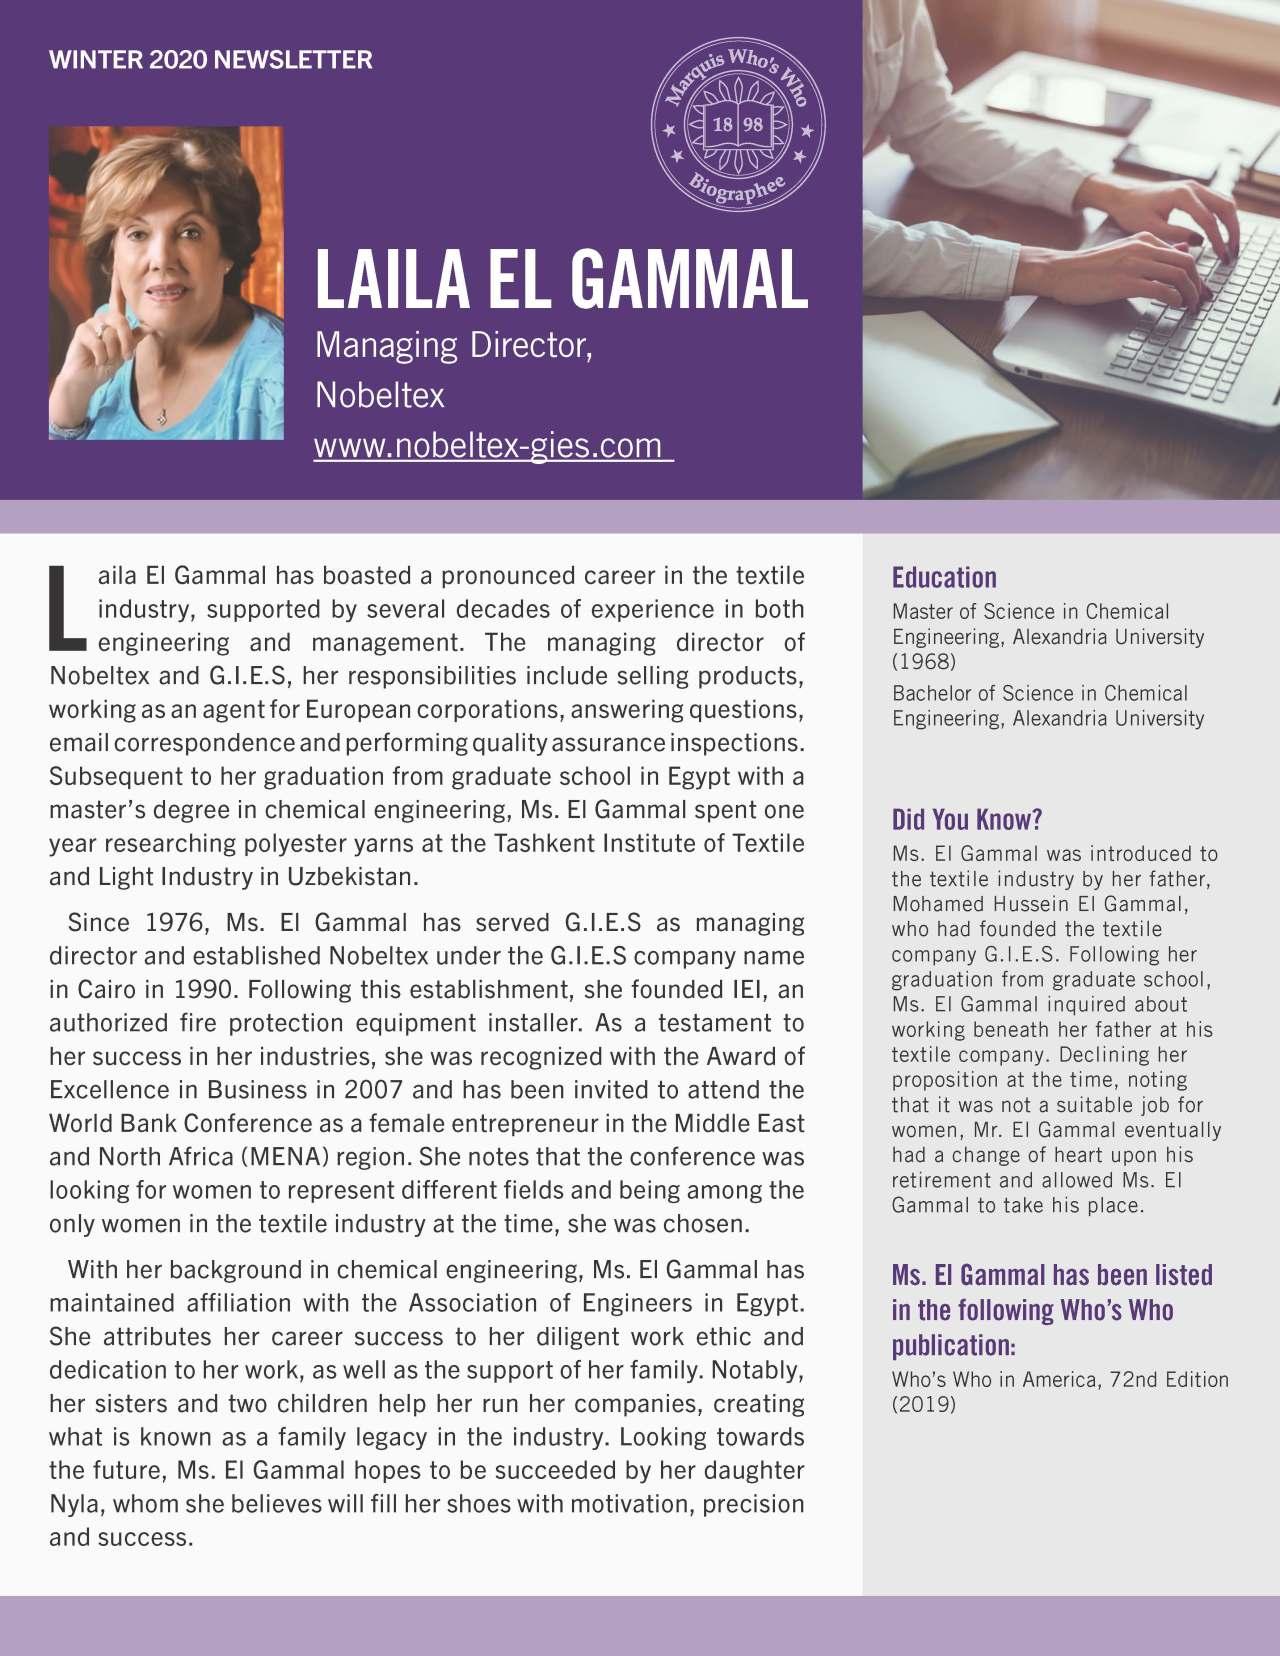 El Gammal, Laila 1425544_4001425544 Newsletter